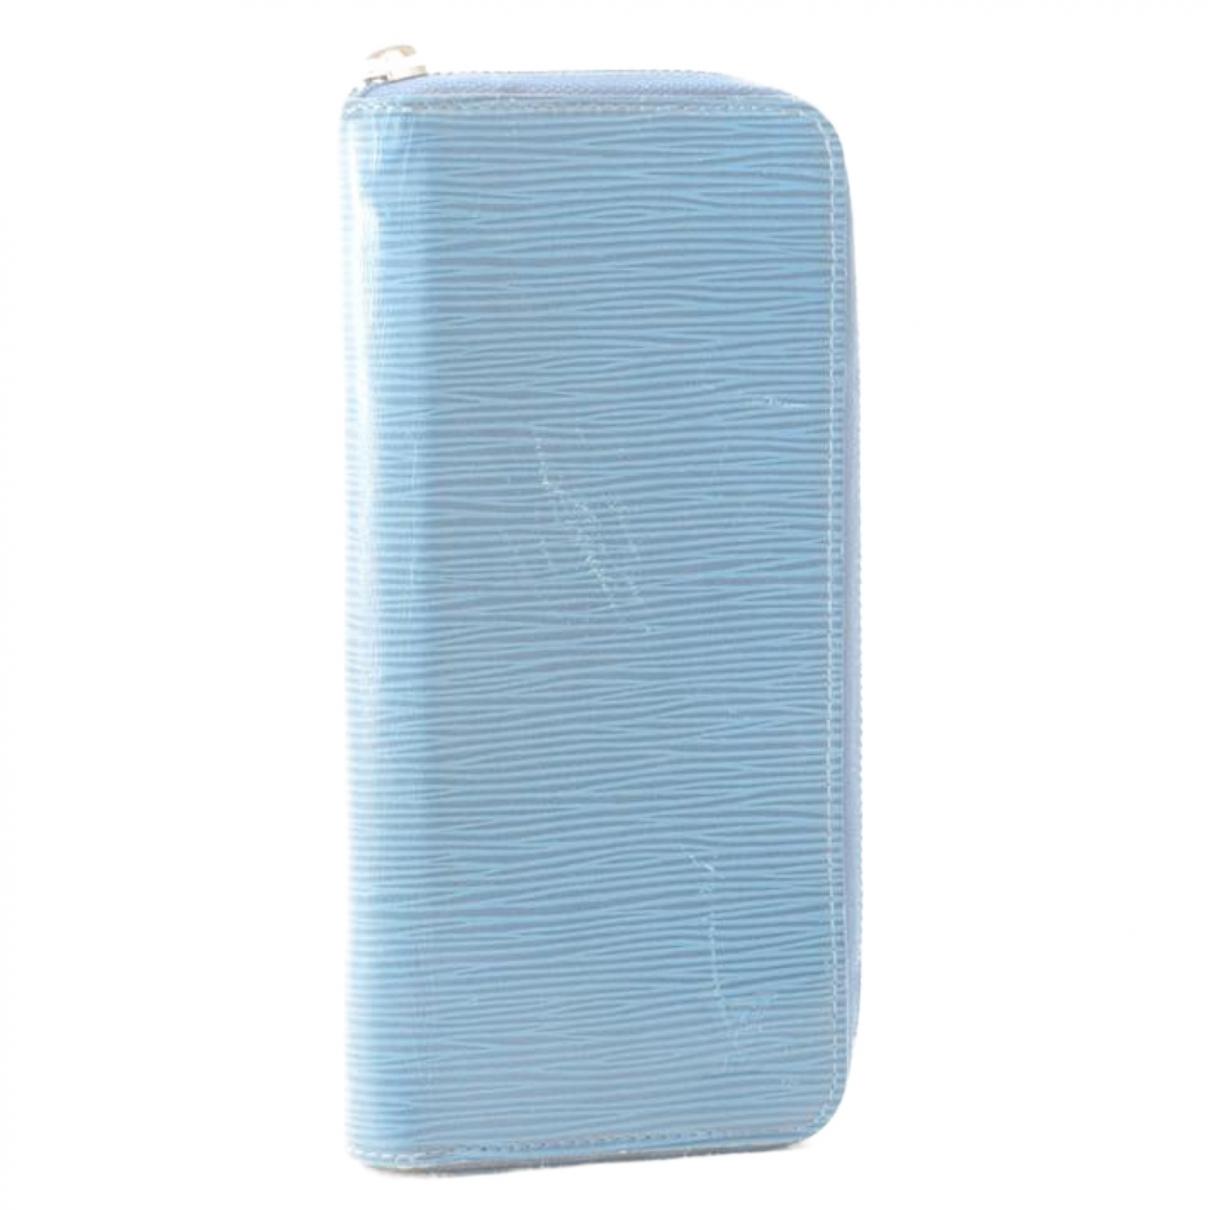 Louis Vuitton \N Blue Leather Purses, wallet & cases for Women \N